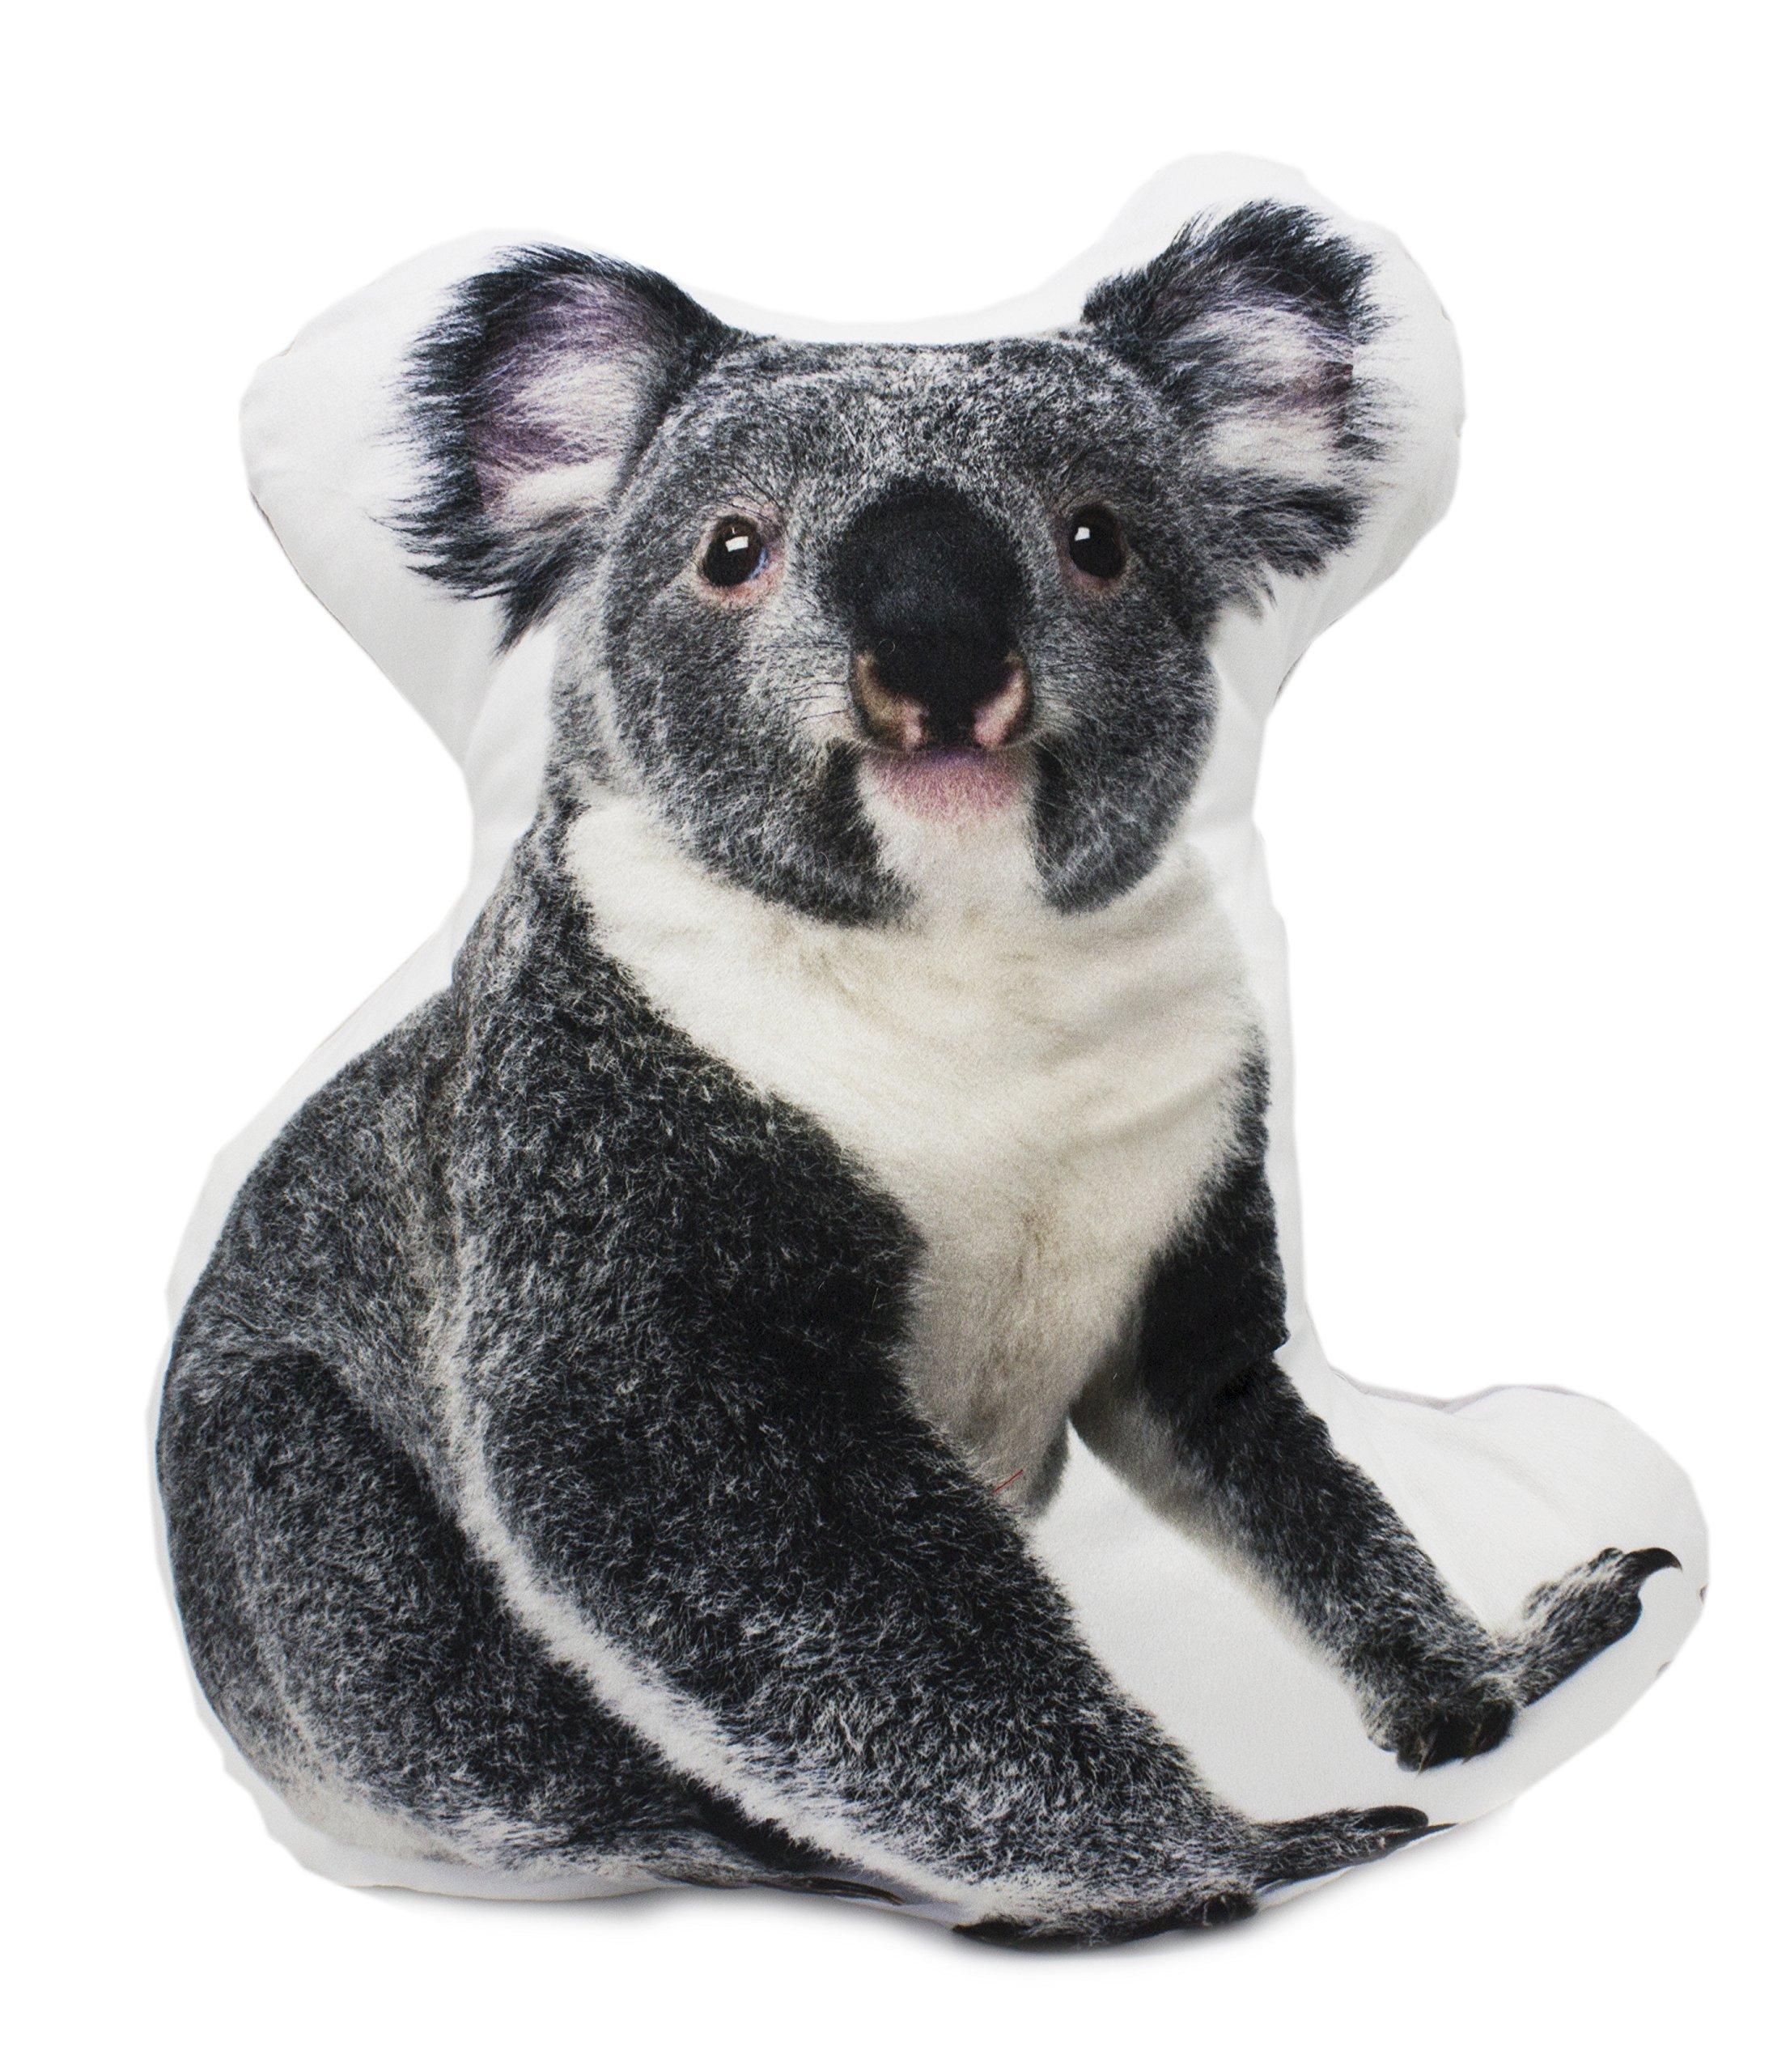 Fennco Styles Decorative 3D Cute Animal Shaped Super Soft and Cozy Kids Adults Cushion Pillow (Koala, Case+Insert)